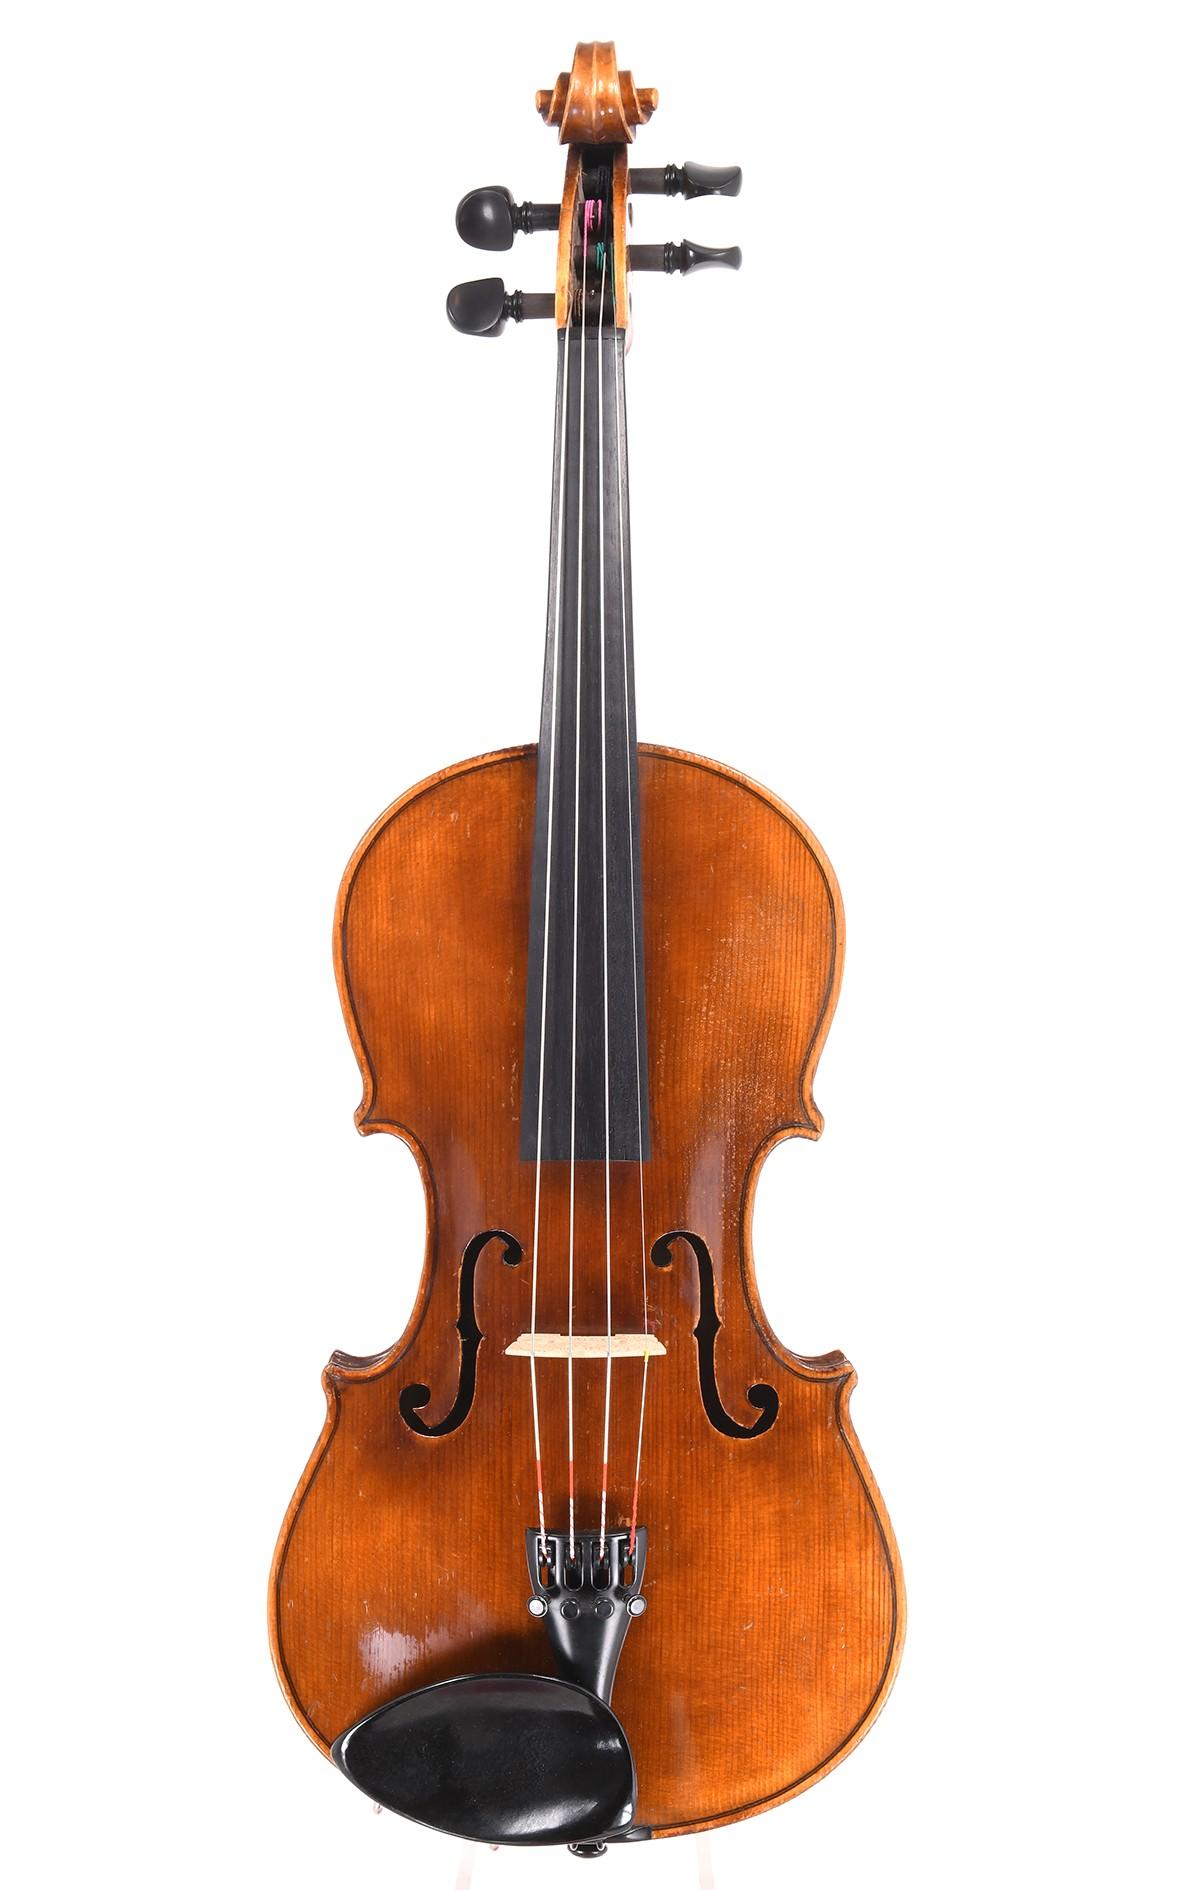 Antique Saxon violin after Stainer, circa 1920